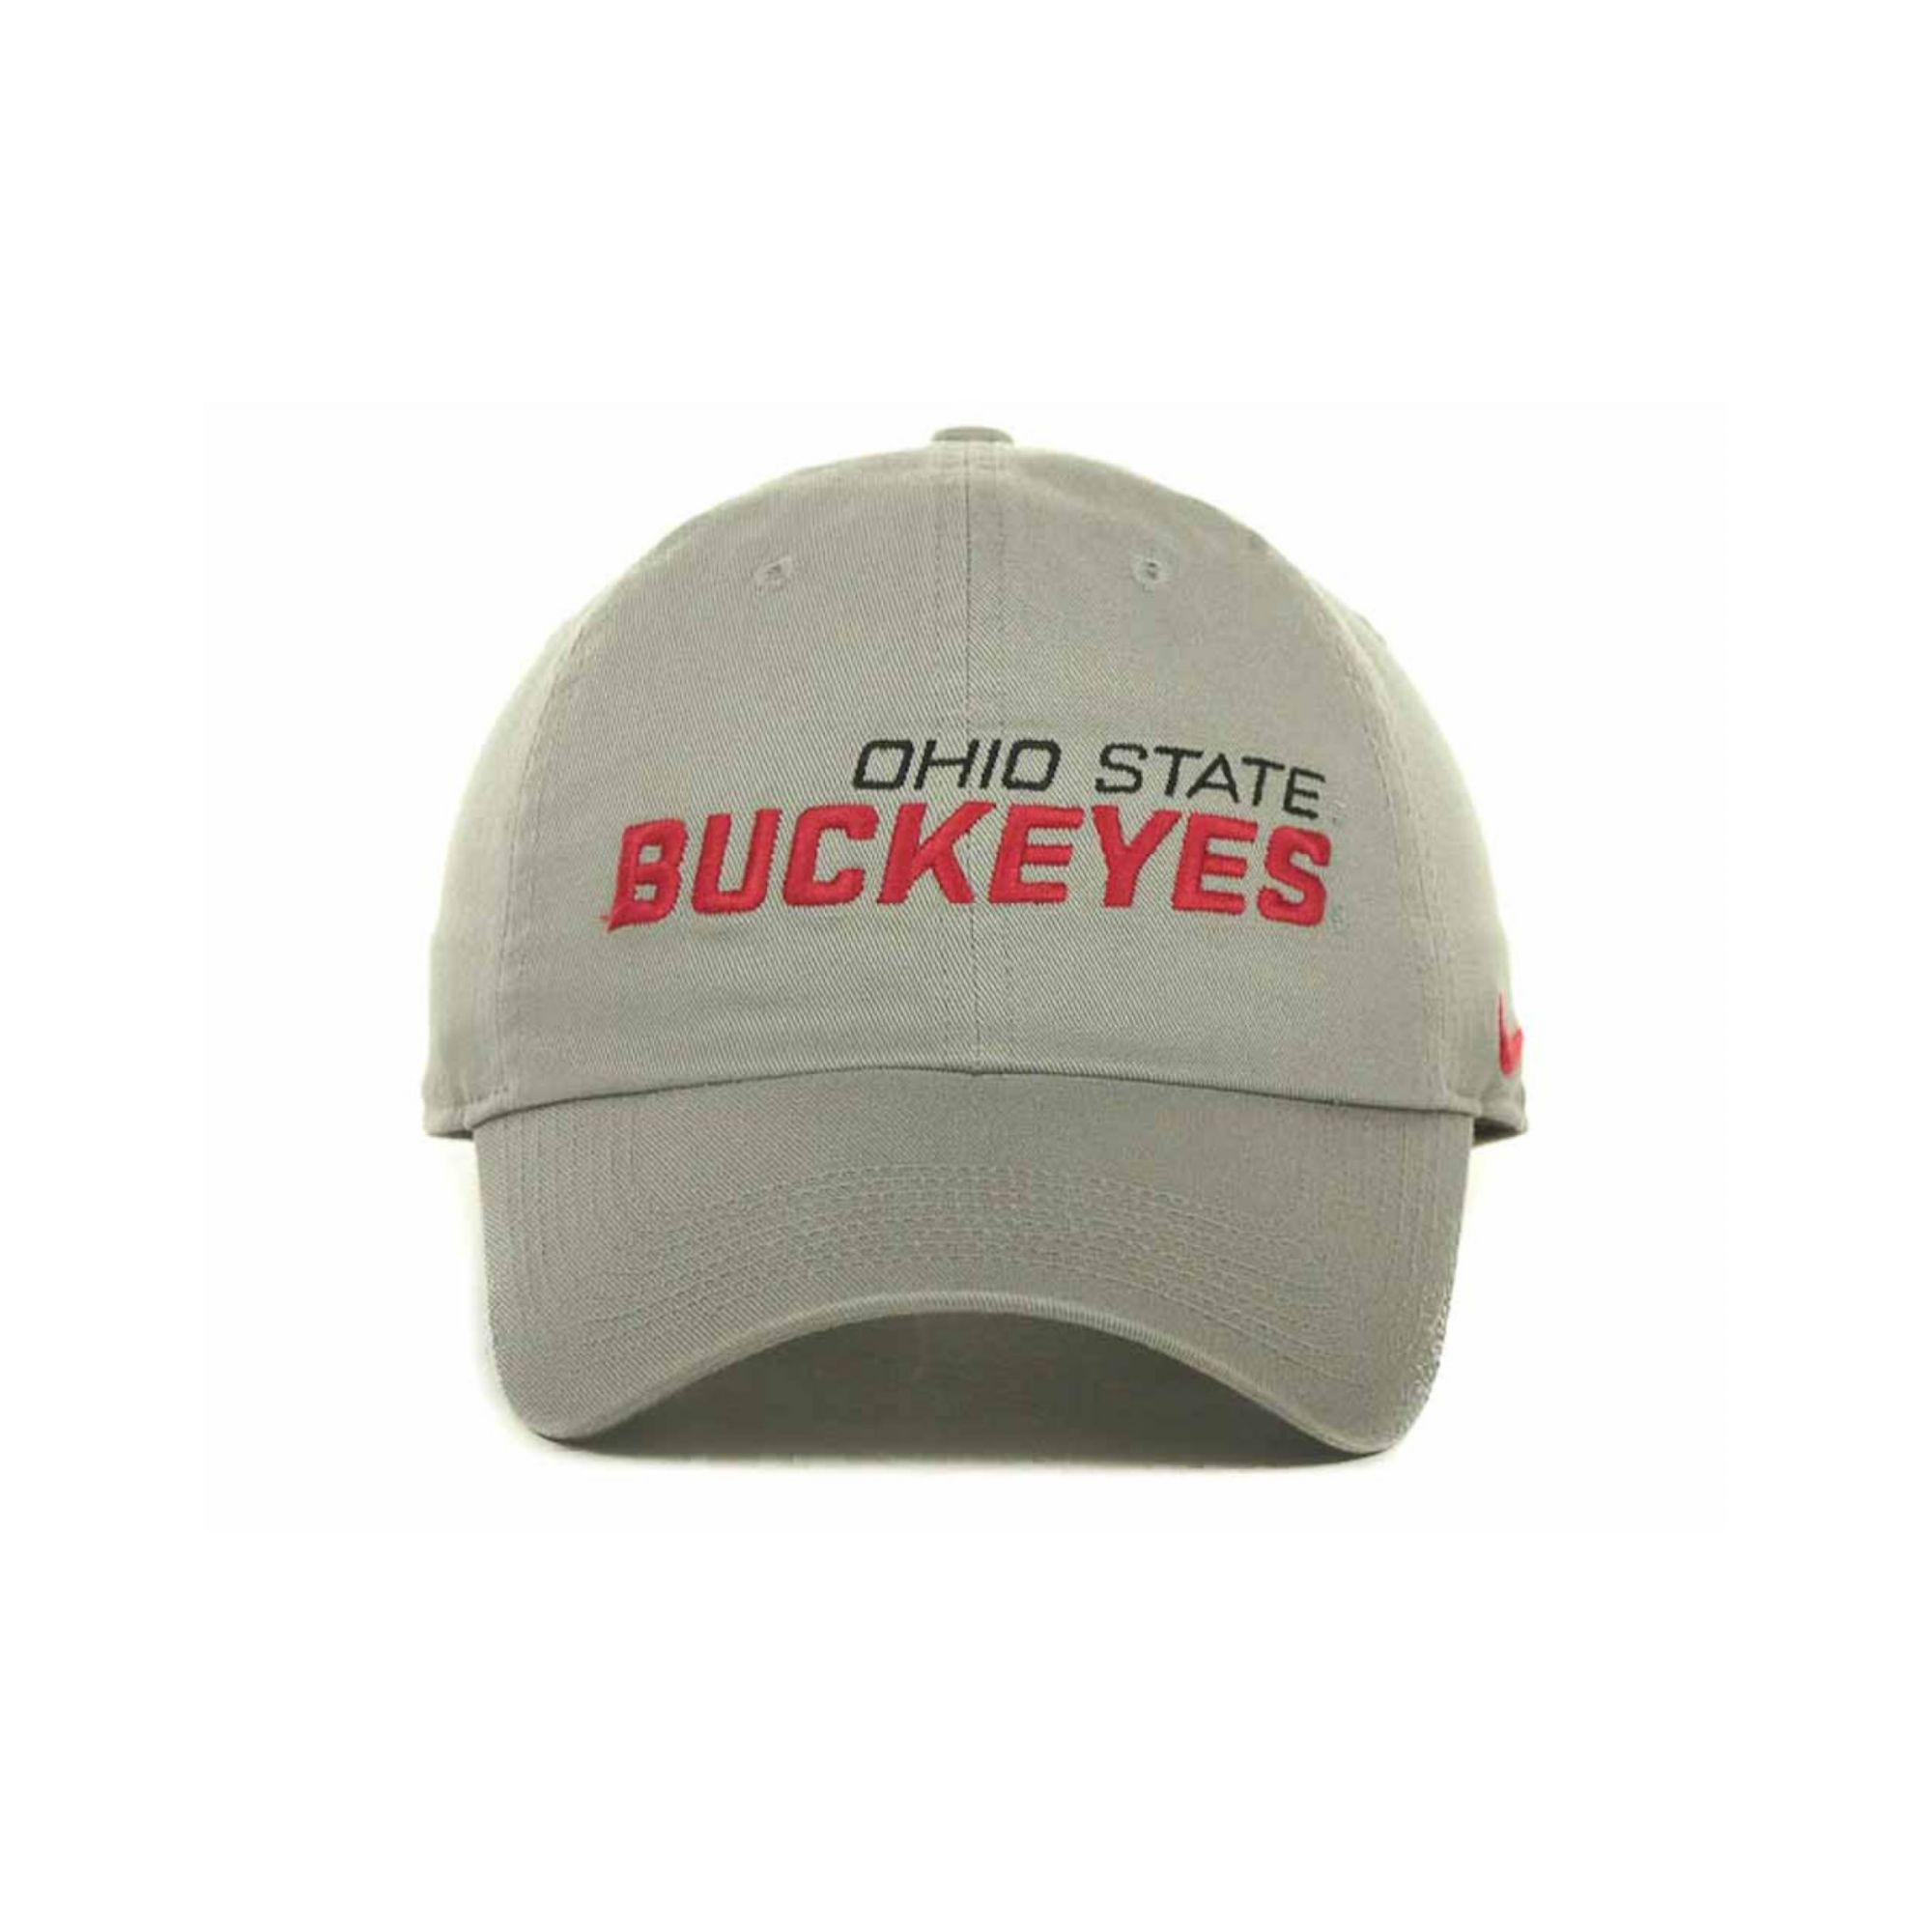 buy popular 4acaf ee005 ... greece lyst nike ohio state buckeyes heritage 86 campus cap in gray for  men 77b46 388c7